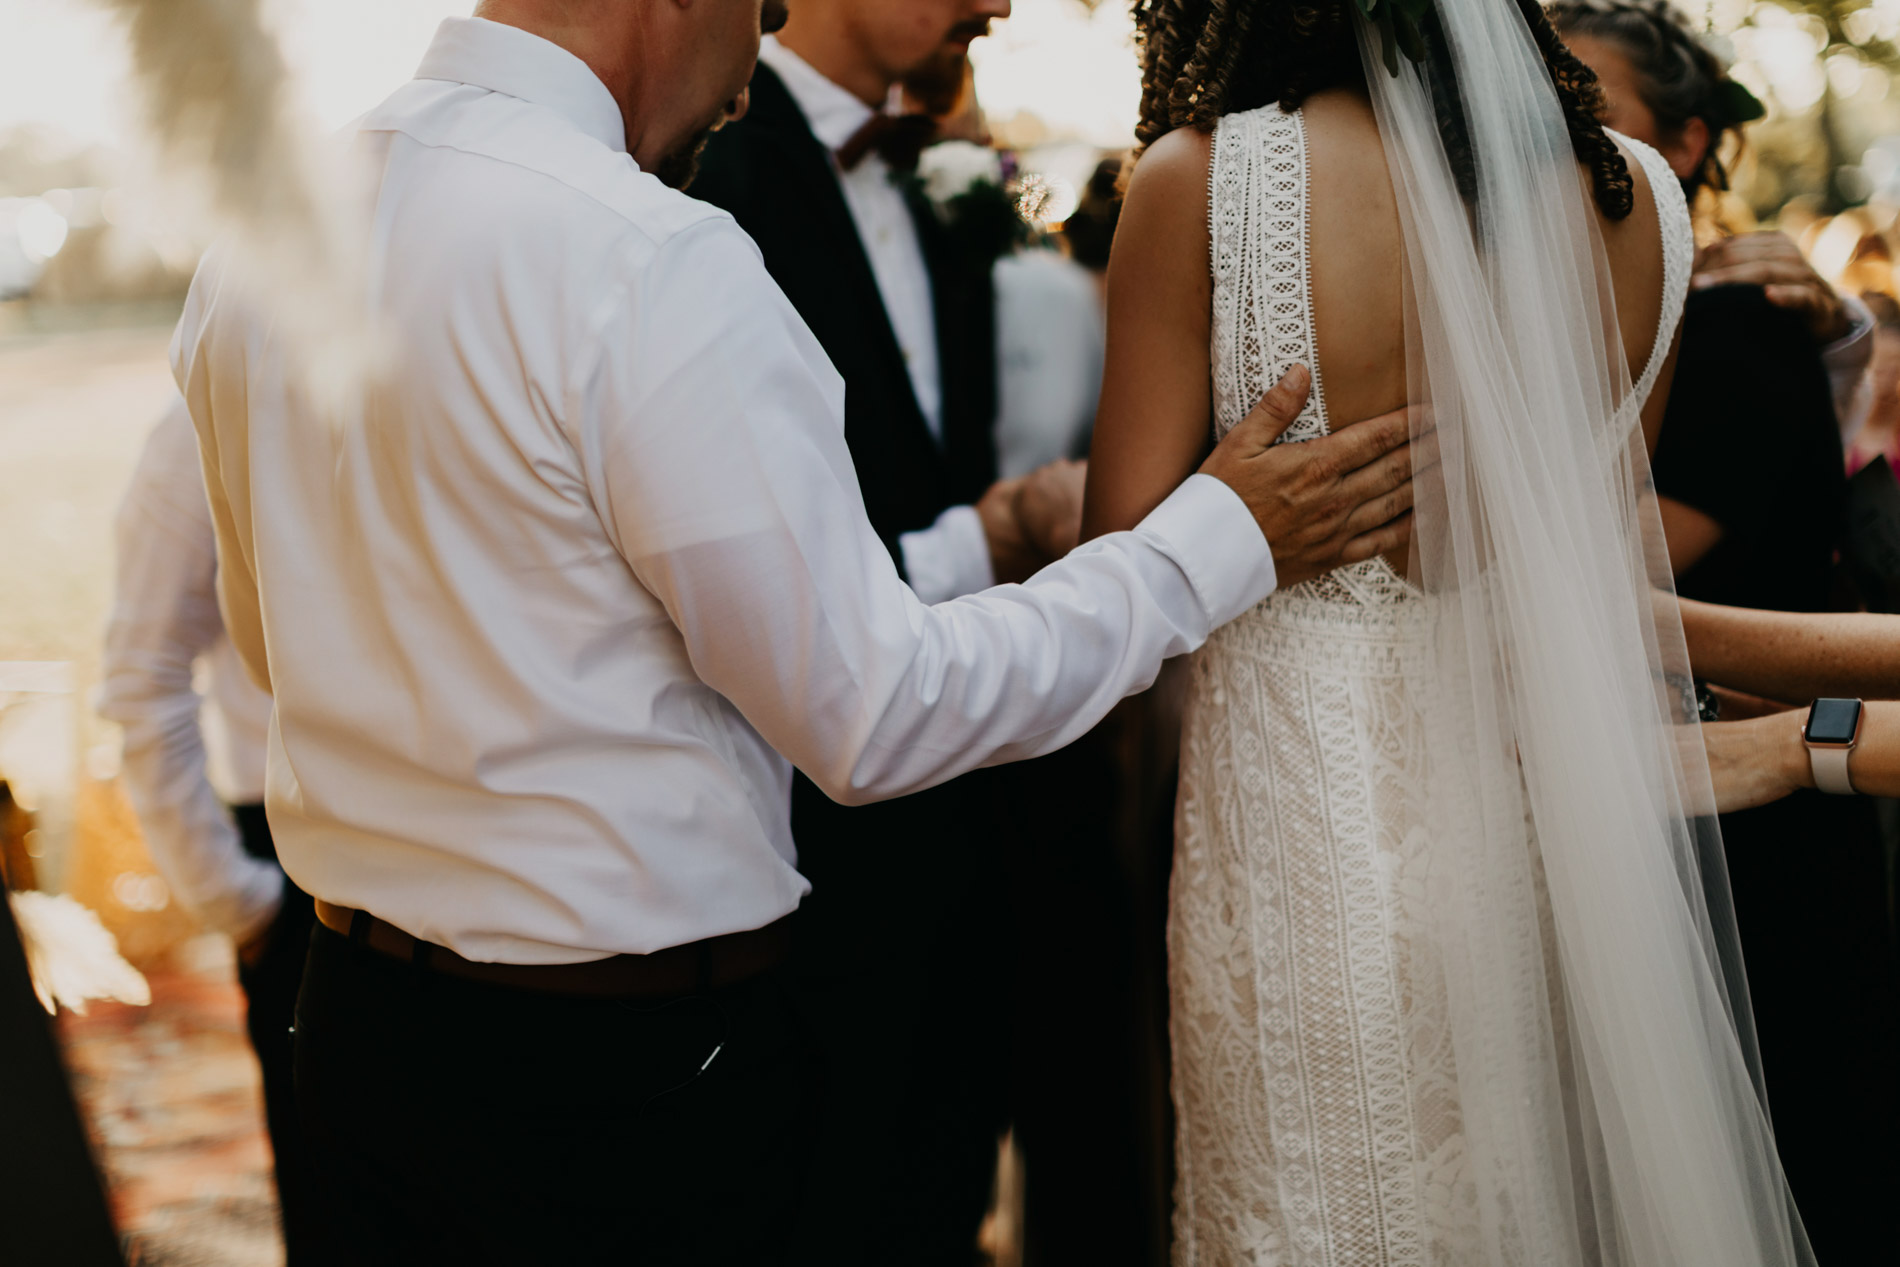 Pastor praying over bride and groom on wedding day